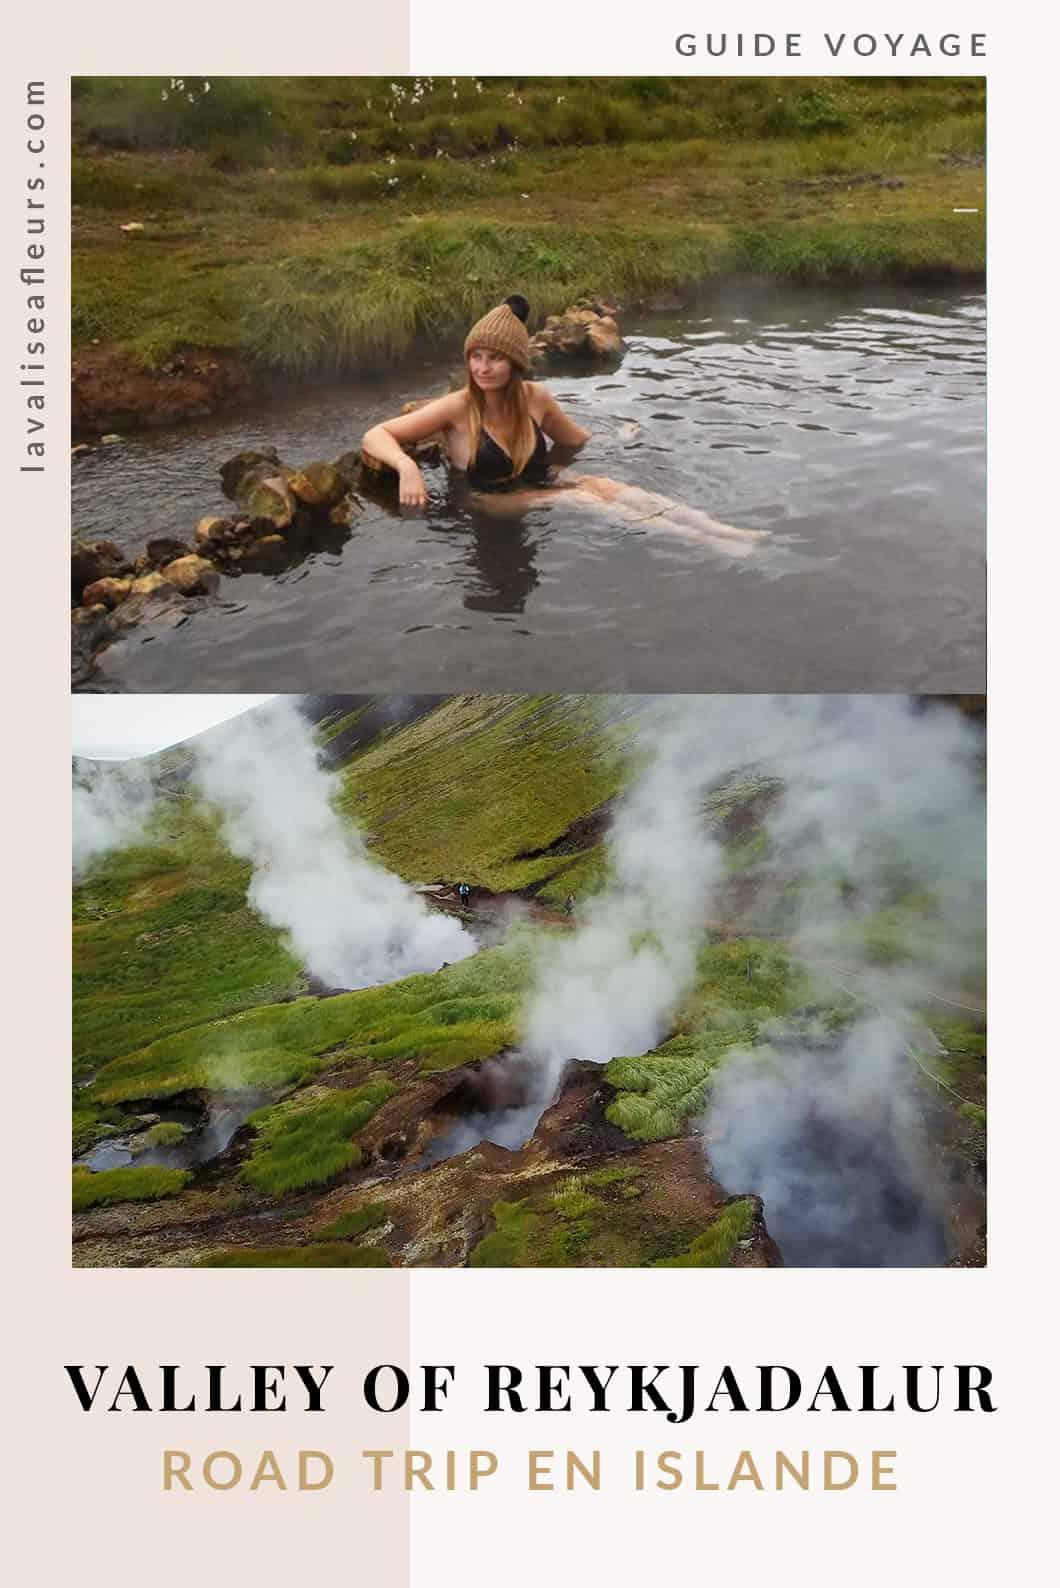 Randonnée dans la Valley of Reykjadalur, road trip en Islande